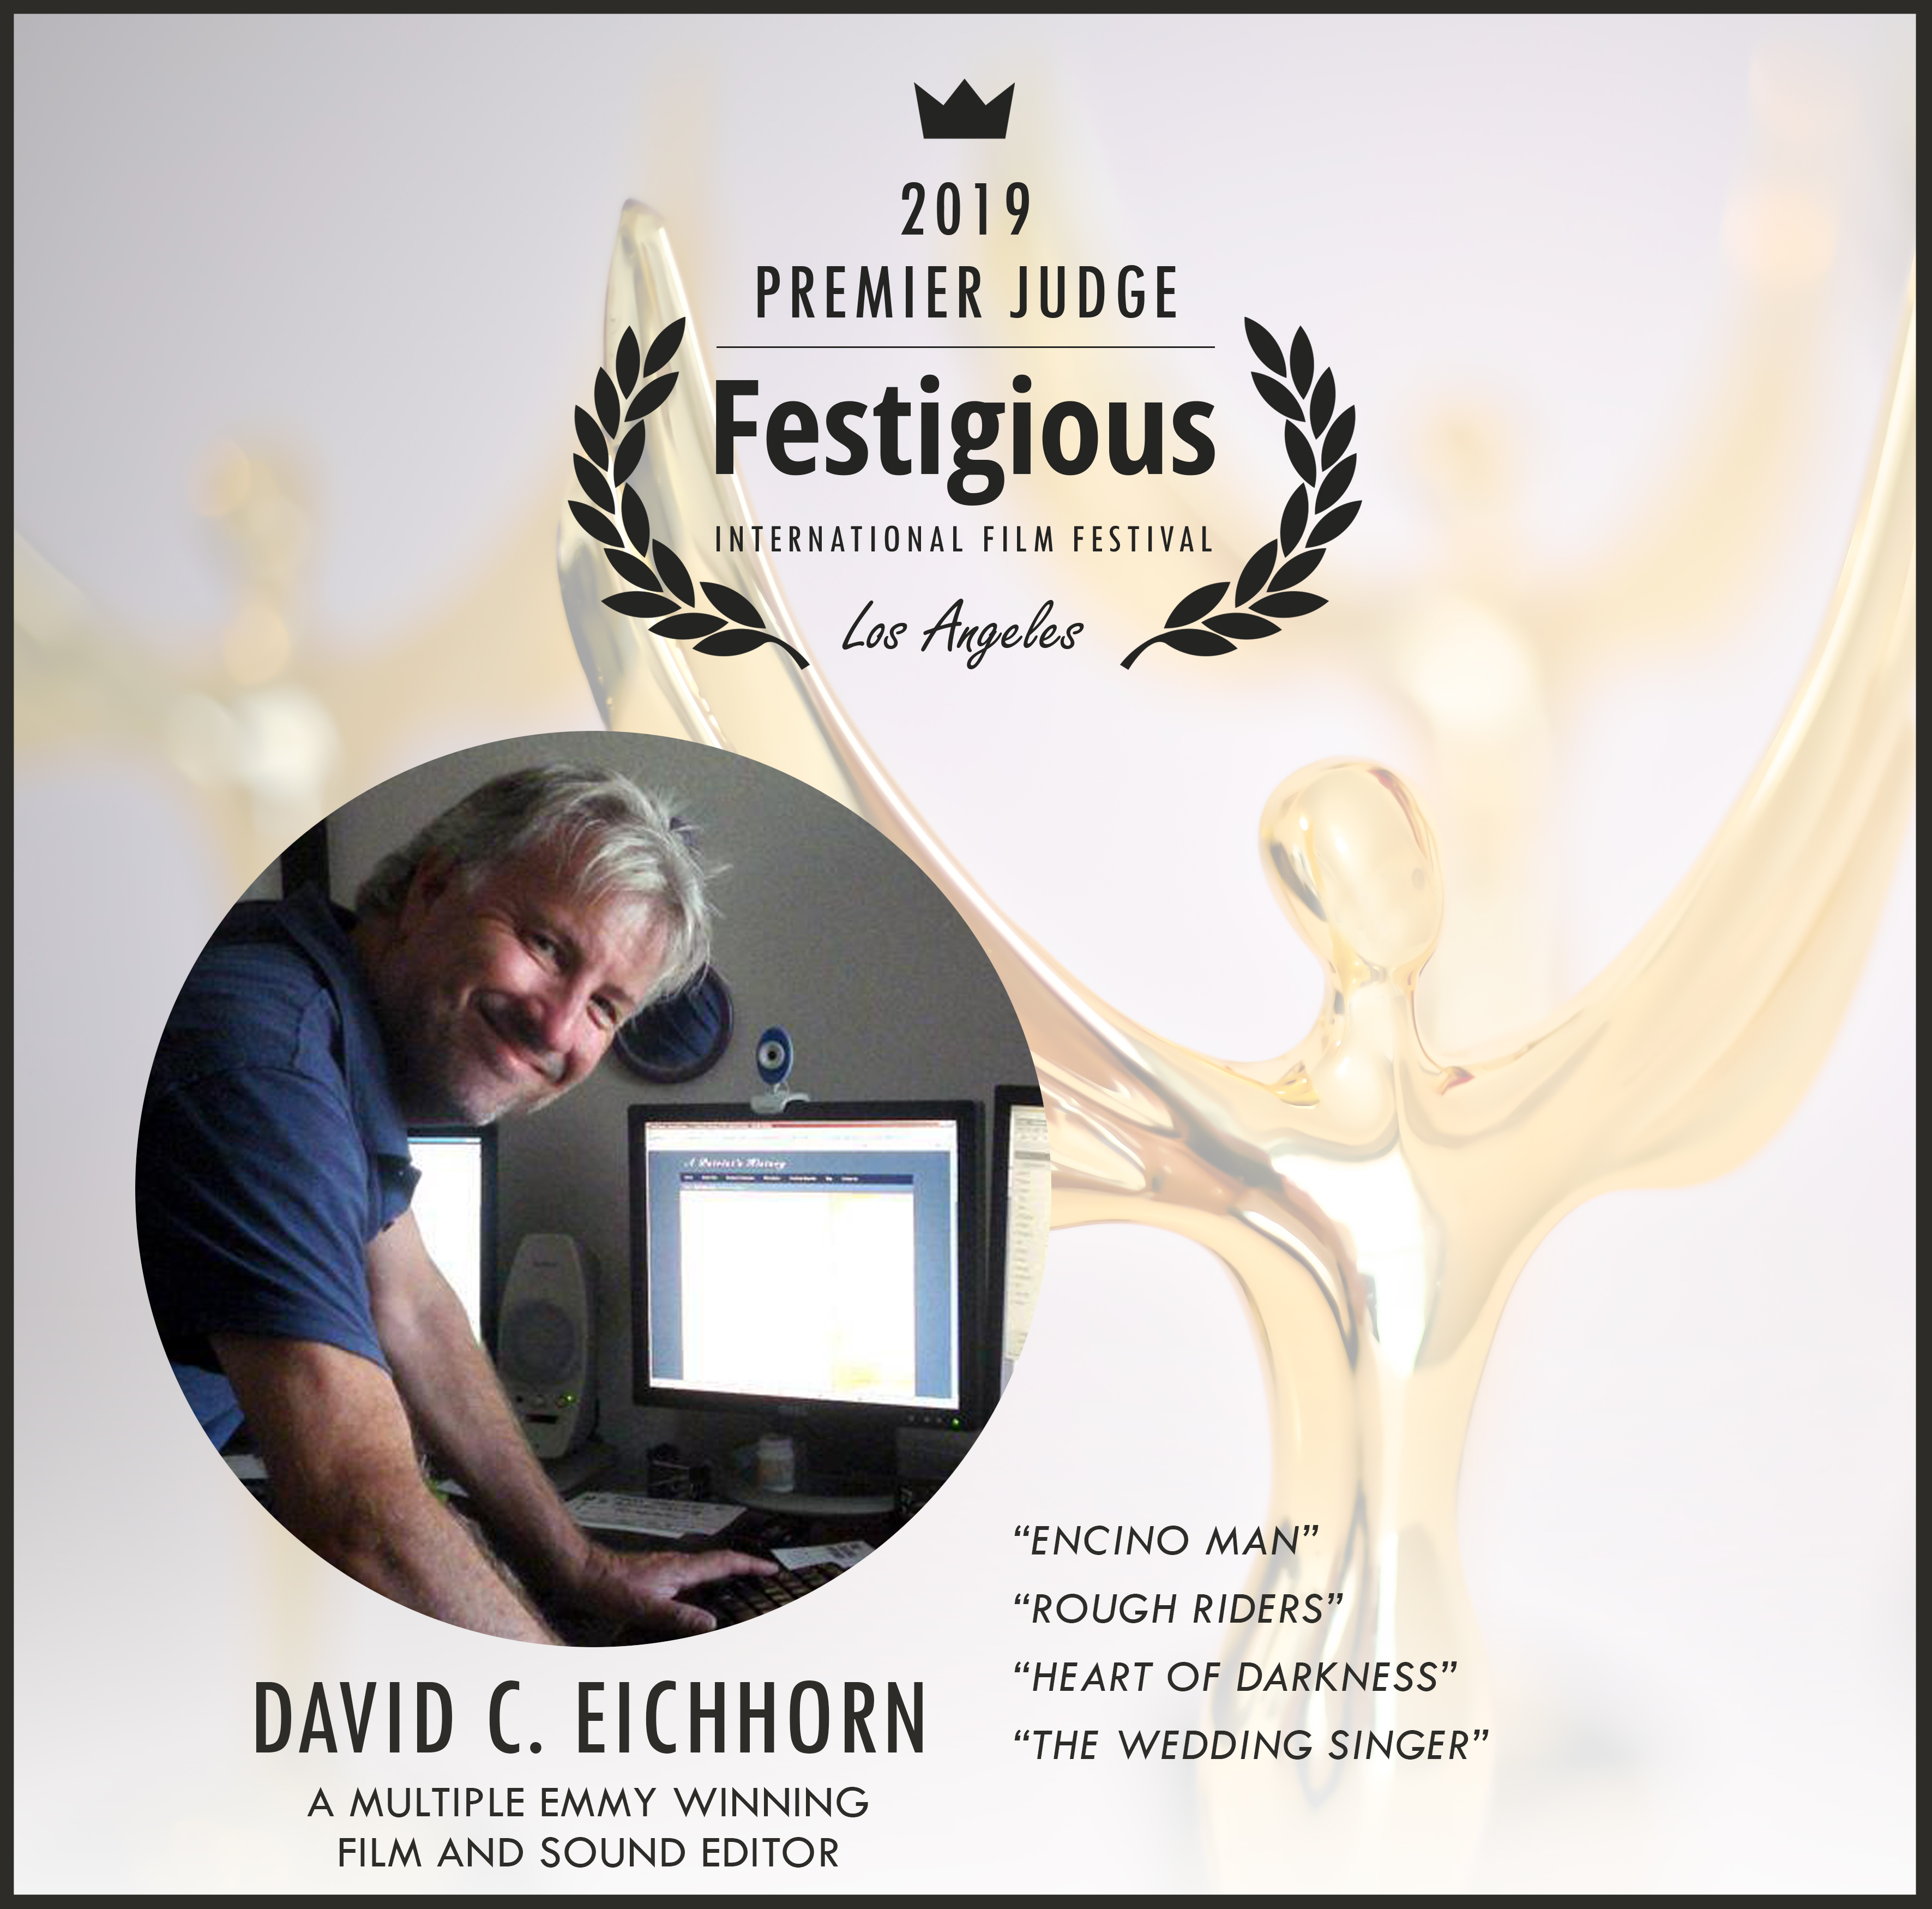 Dave Eichhorn Festigious